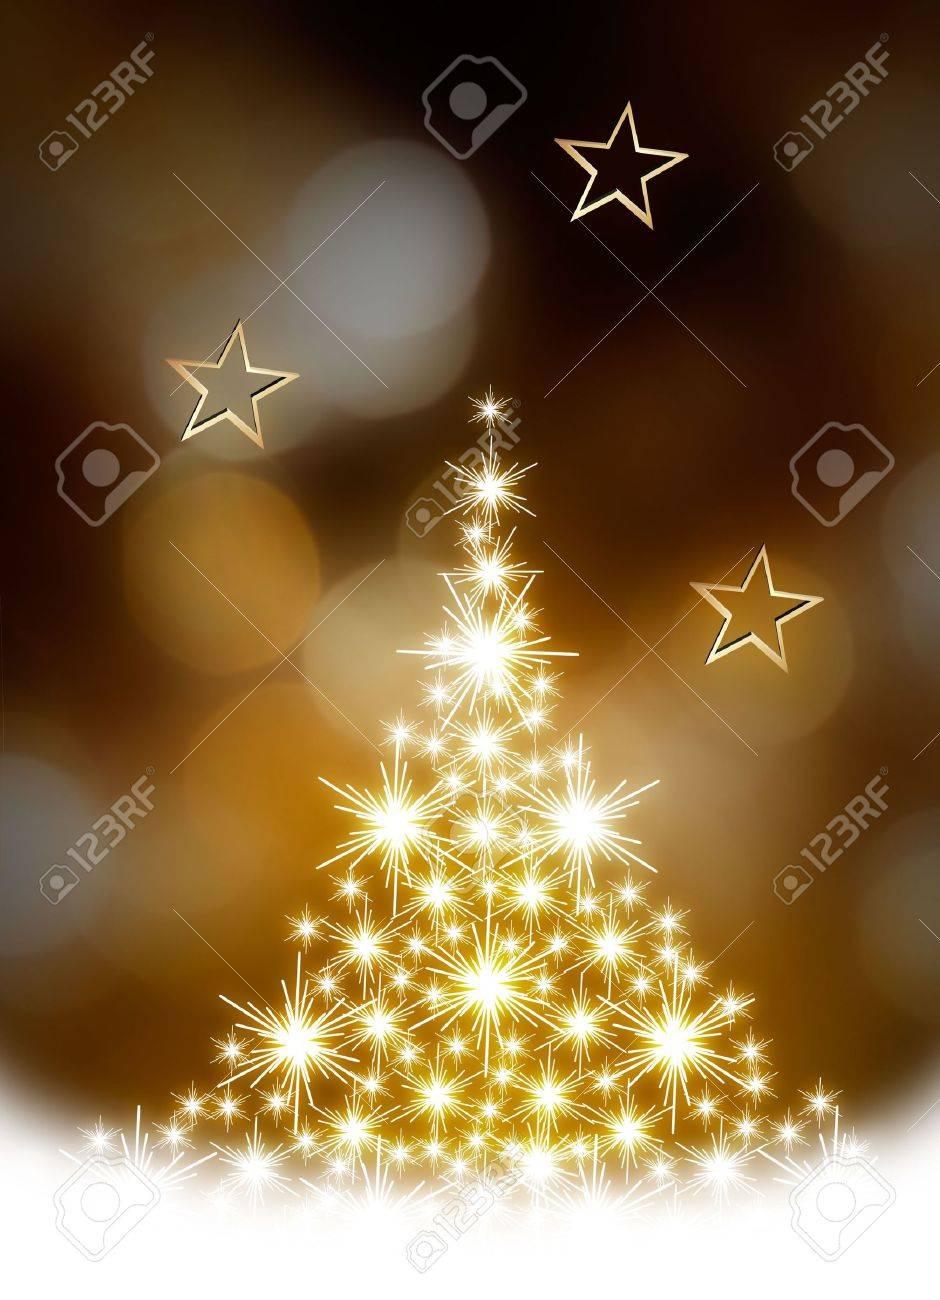 Christmas tree illustration on golden background Stock Illustration - 3780850